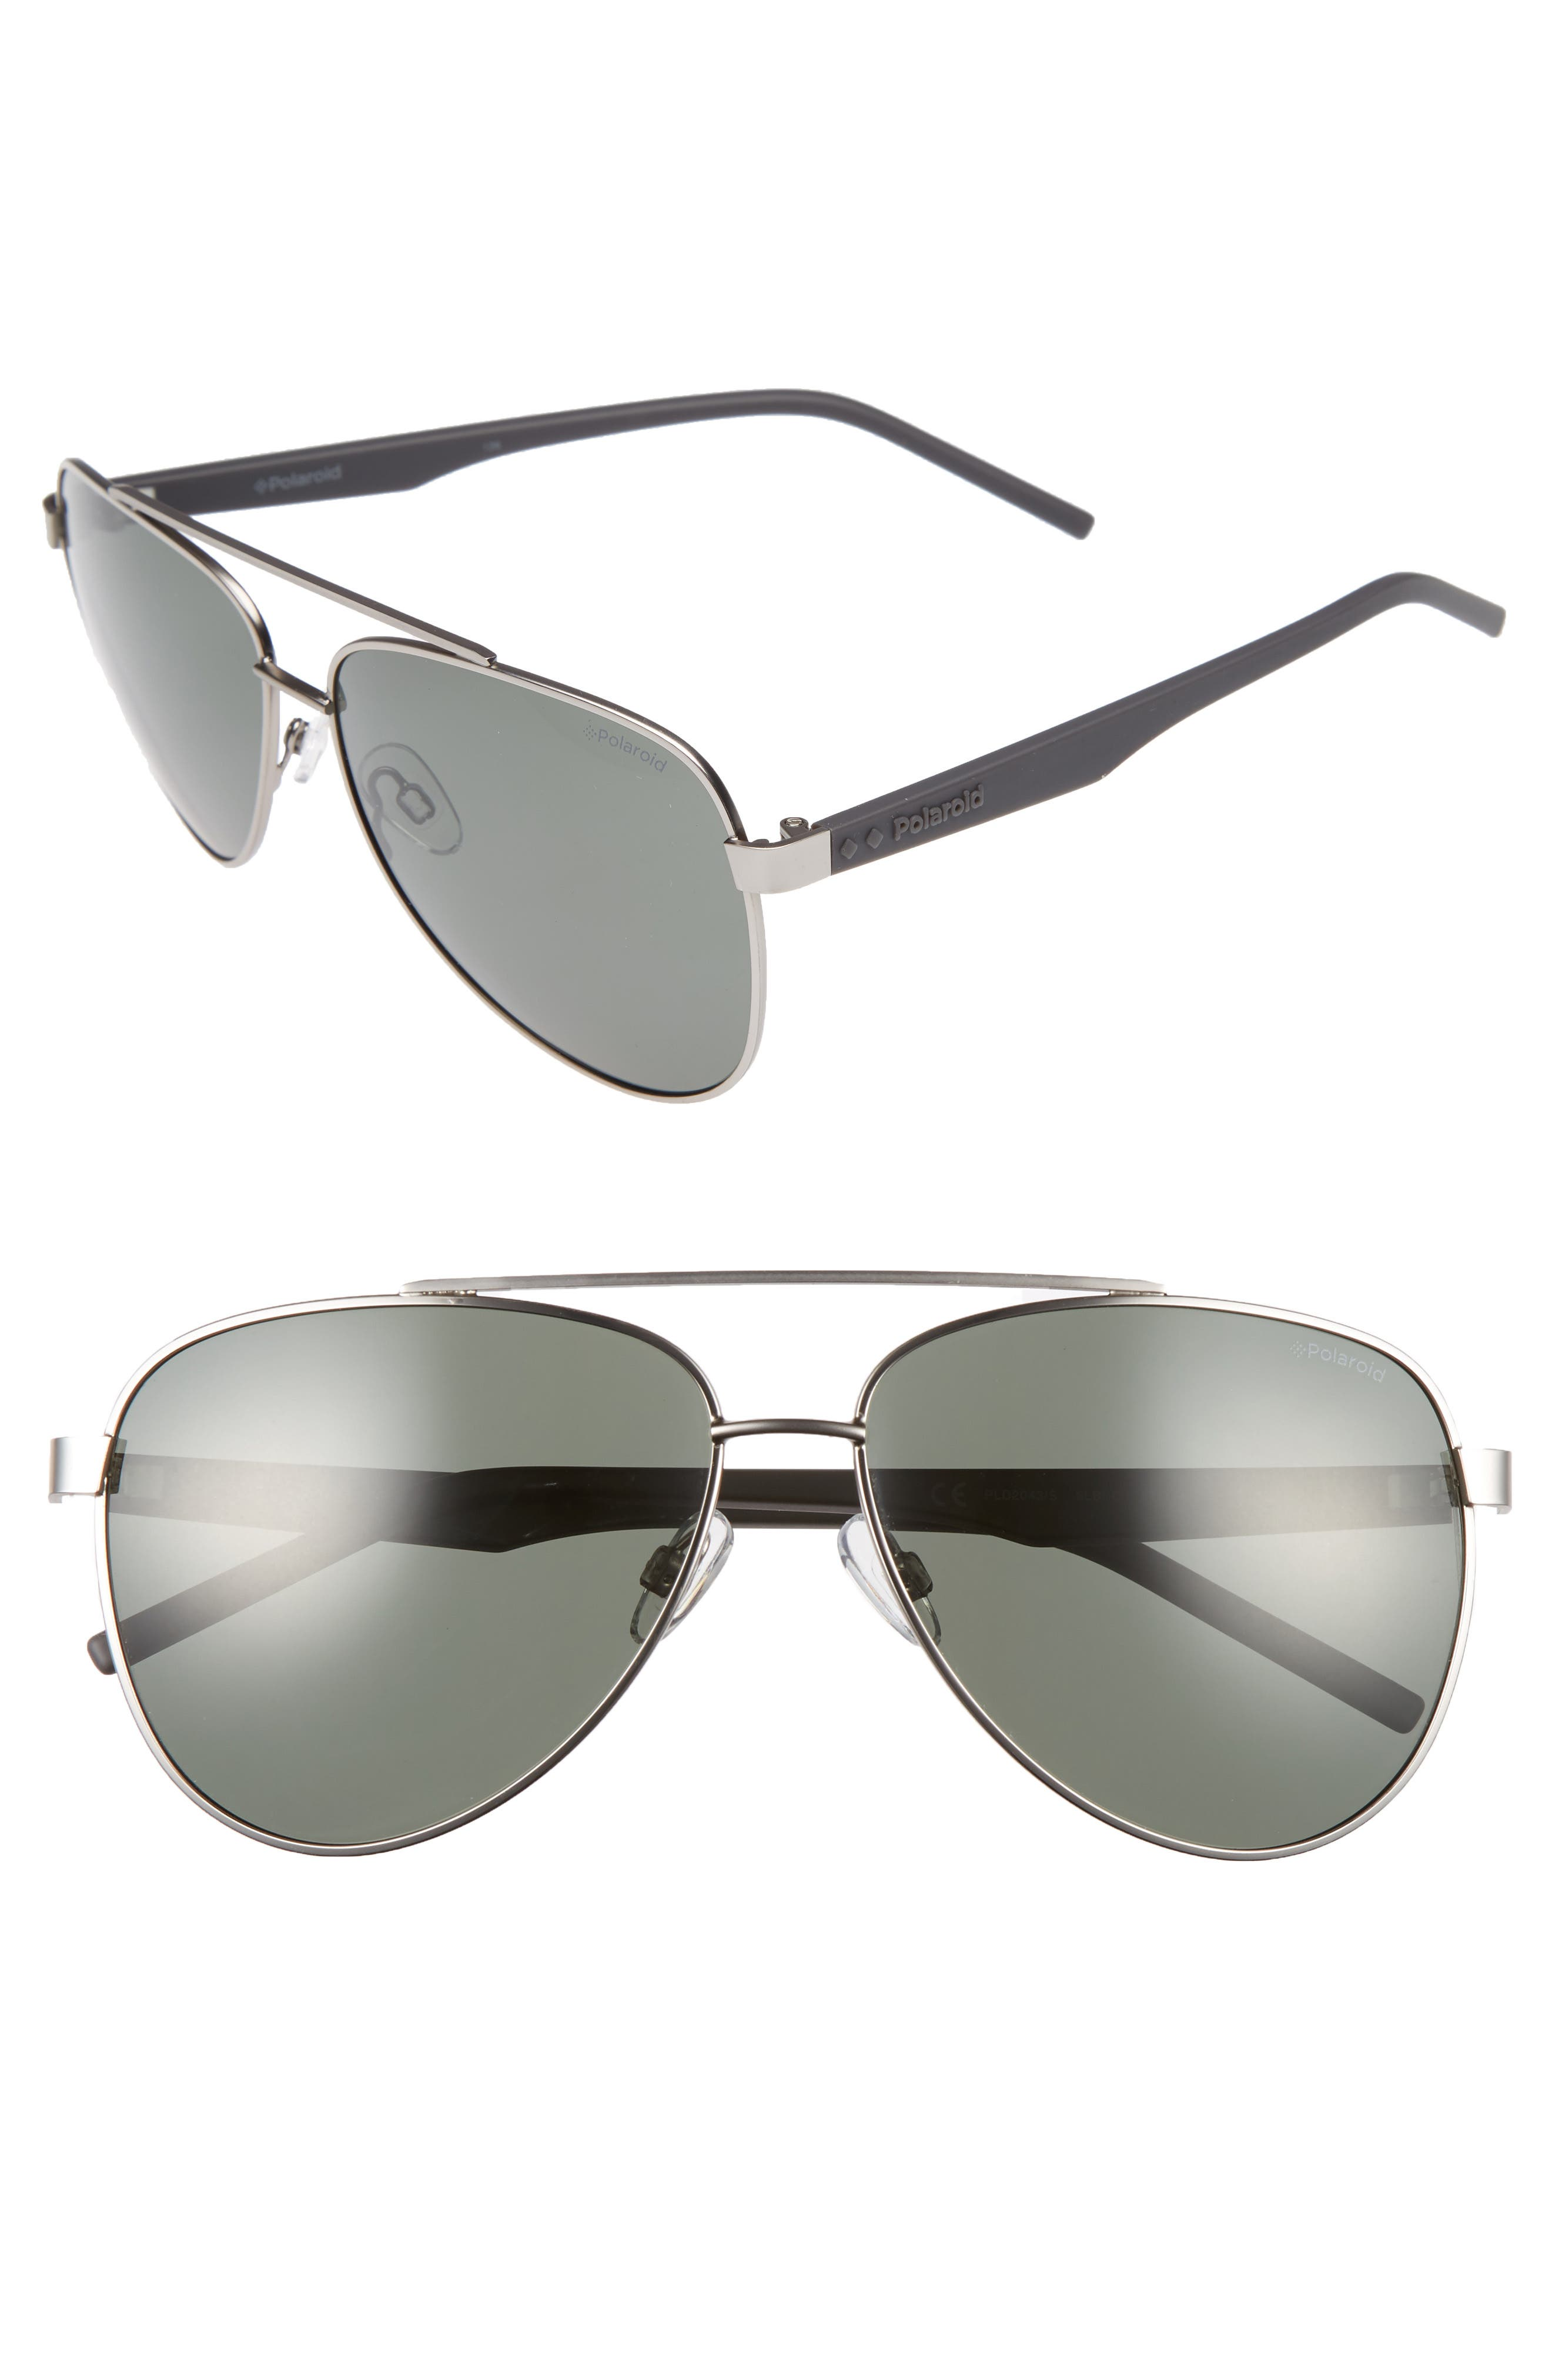 Main Image - Polaroid 61mm Polarized Aviator Sunglasses